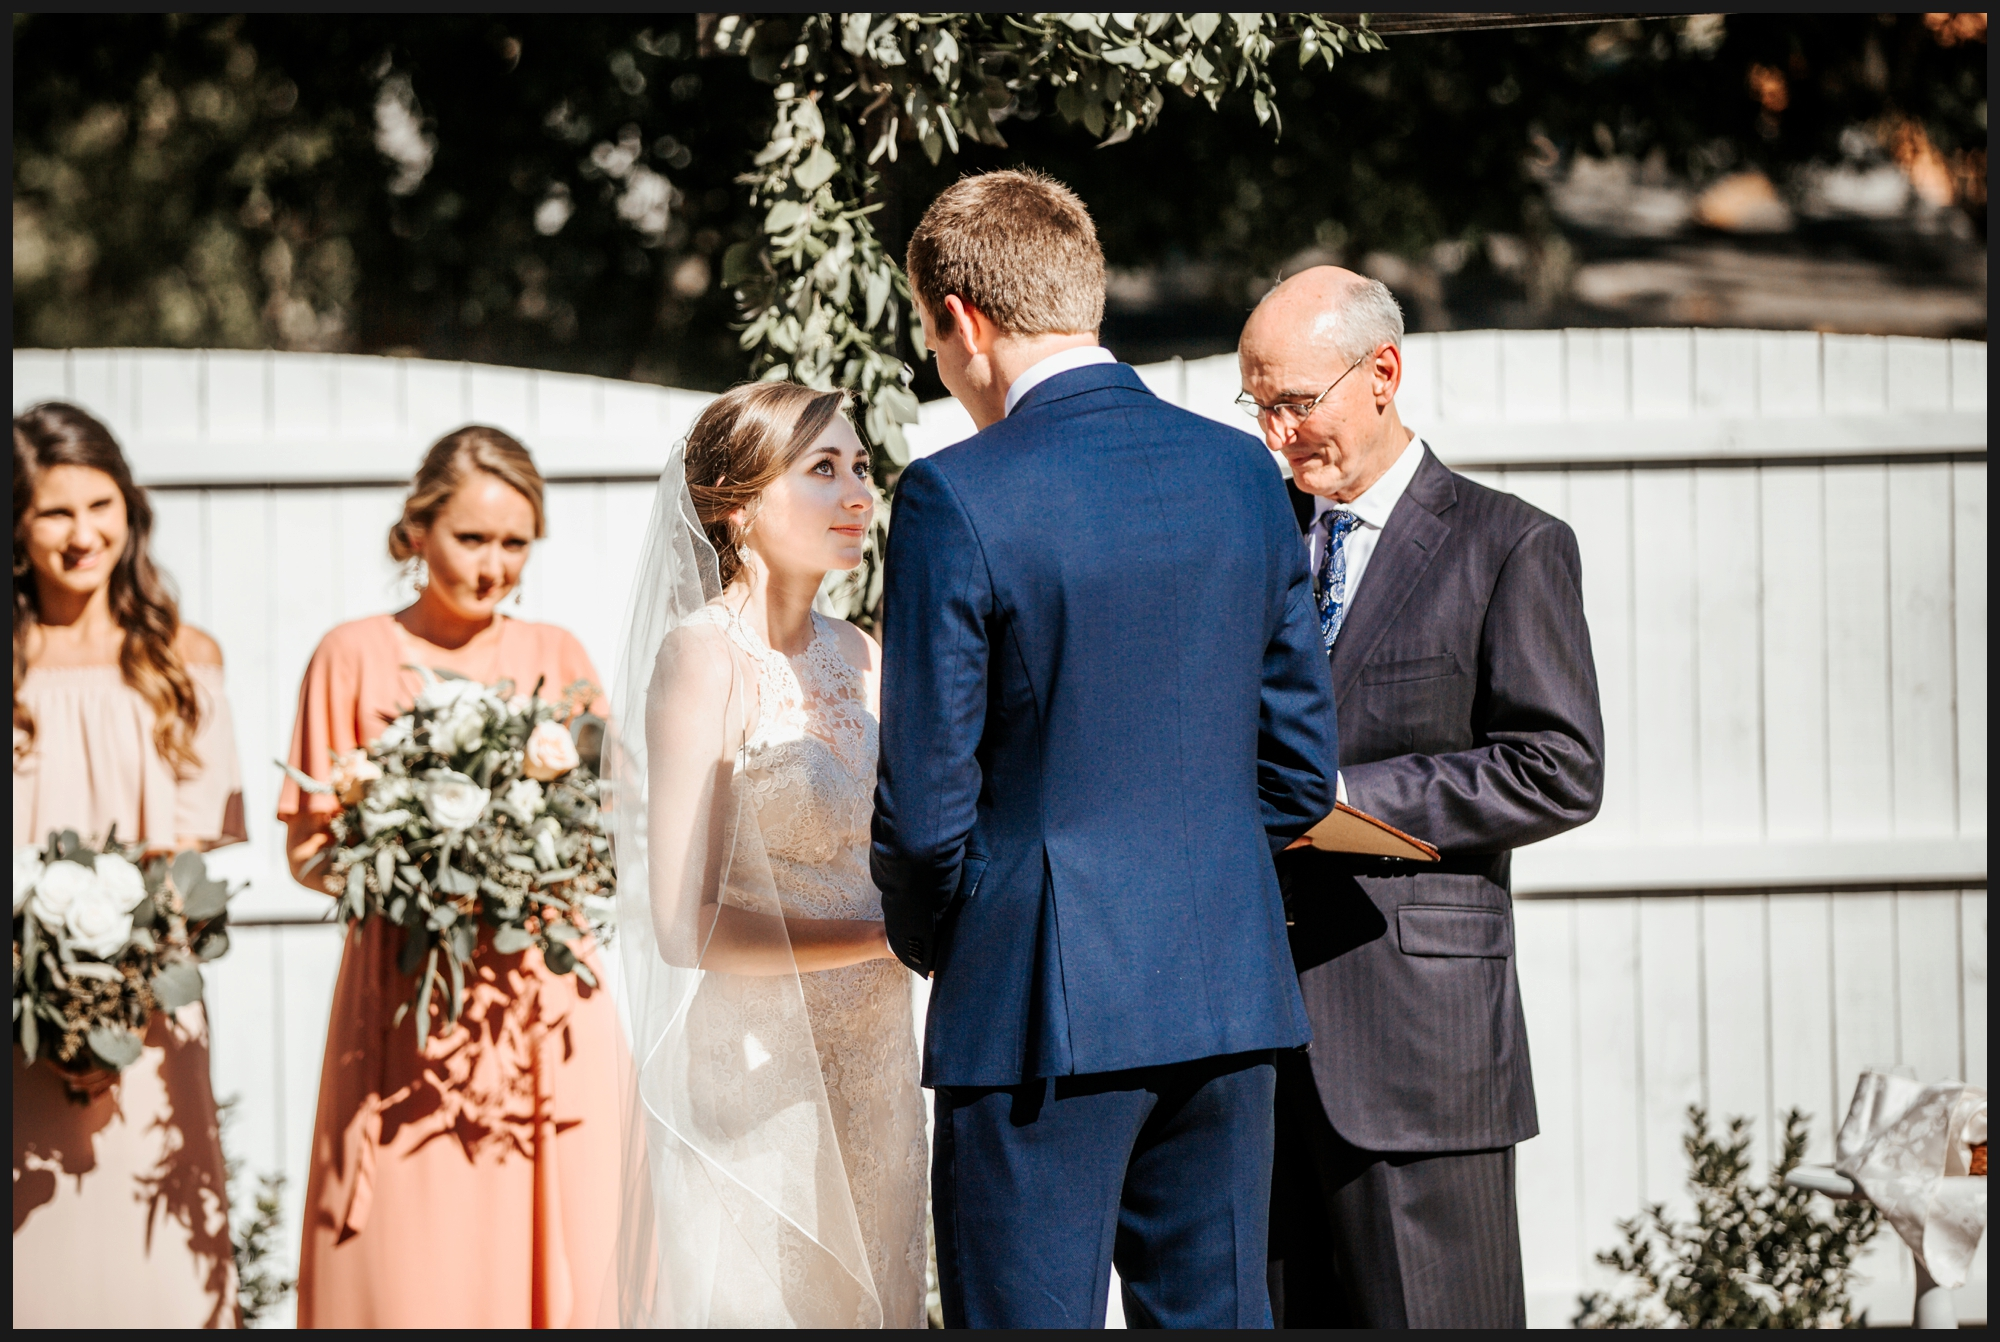 Orlando-Wedding-Photographer-destination-wedding-photographer-florida-wedding-photographer-bohemian-wedding-photographer_1748.jpg